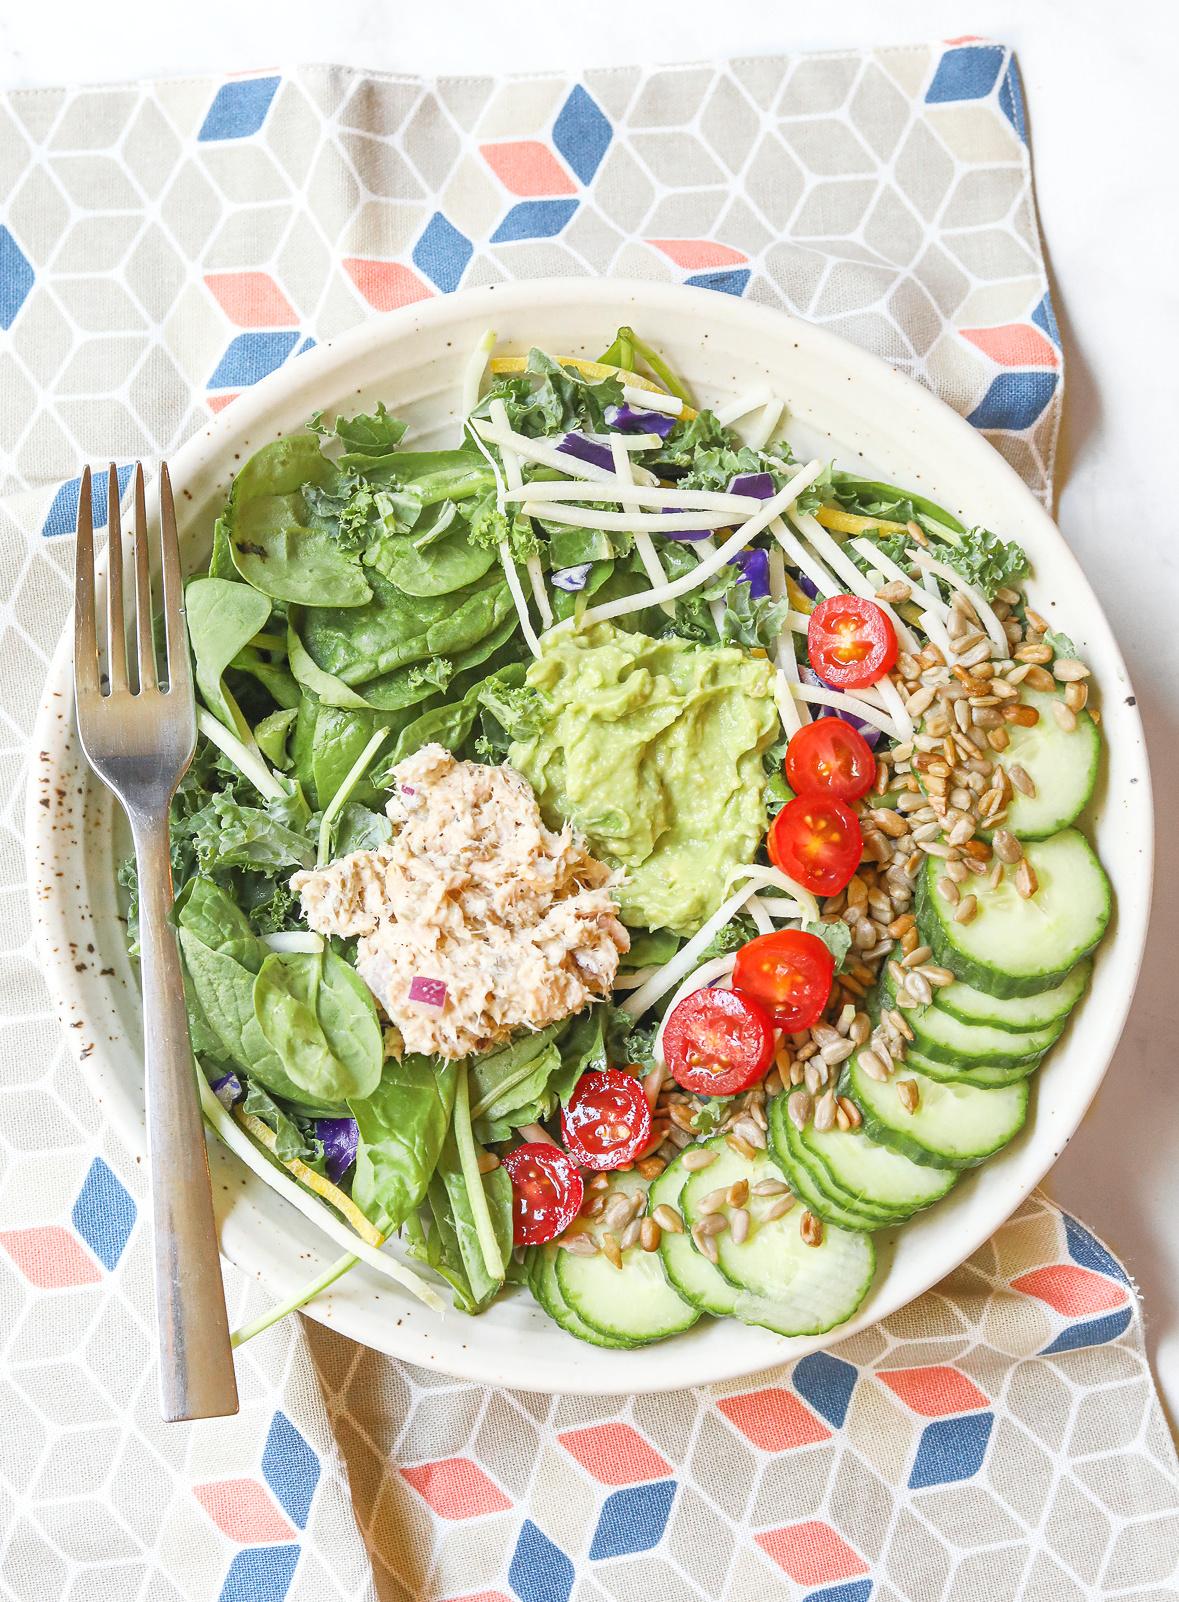 cucumber, kale salad, avocado aioli, veganise, tuna salad, sprouts, spinach, gluten free, dairy free,